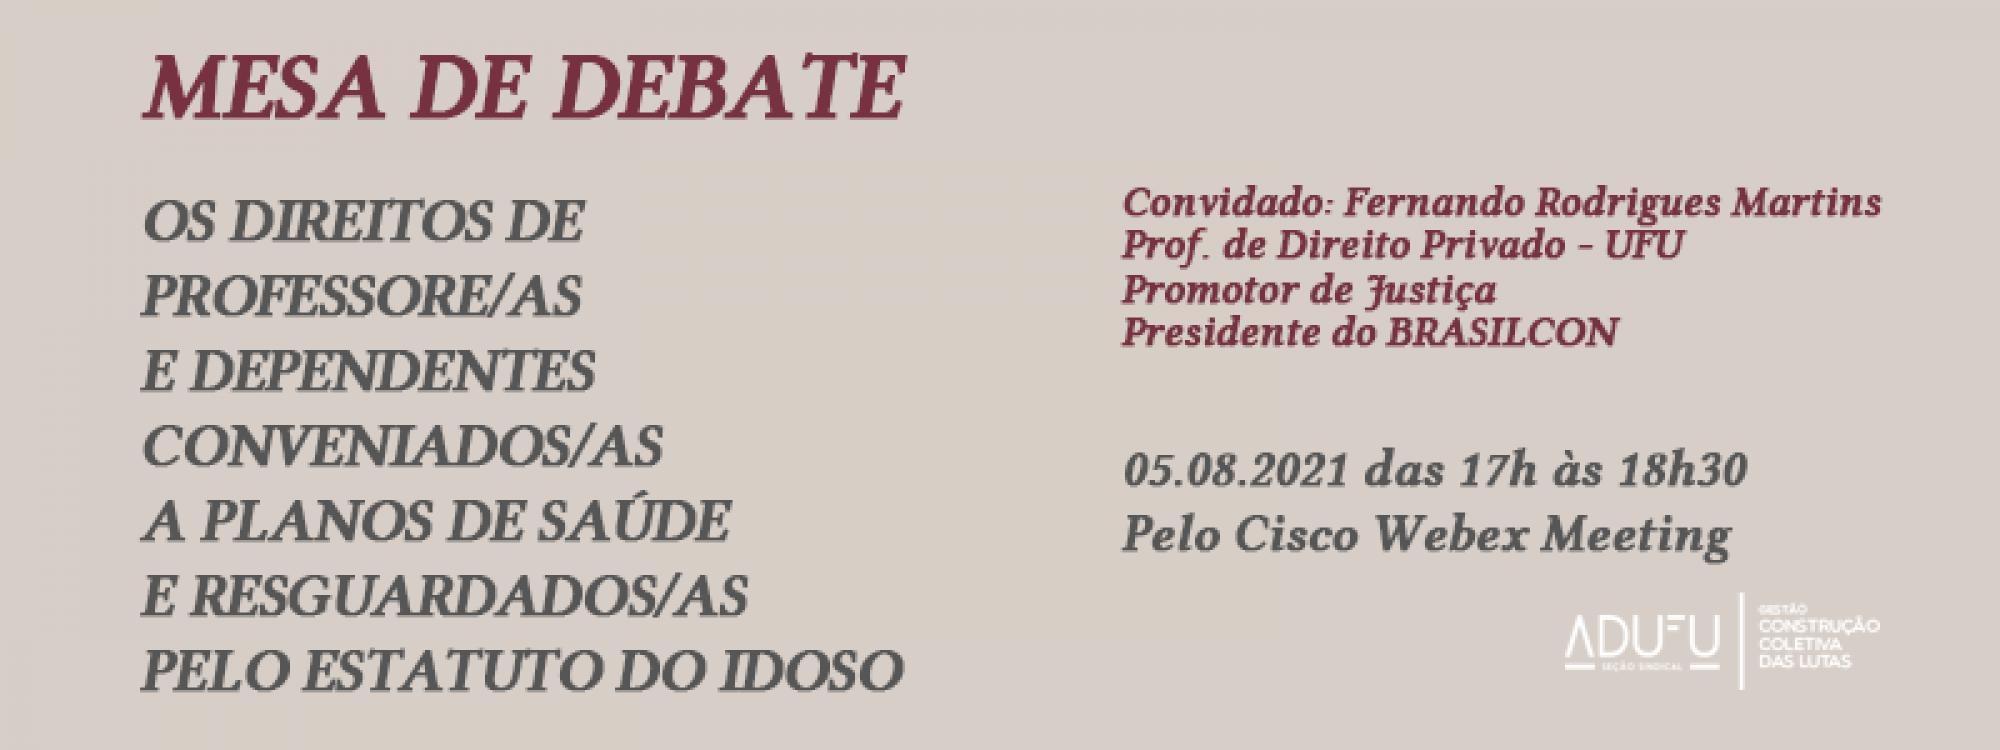 ADUFU realiza mesa de debate sobre os direitos de professore/as e dependentes conveniados/as a planos de saúde e resguardados/as pelo Estatuto do Idoso